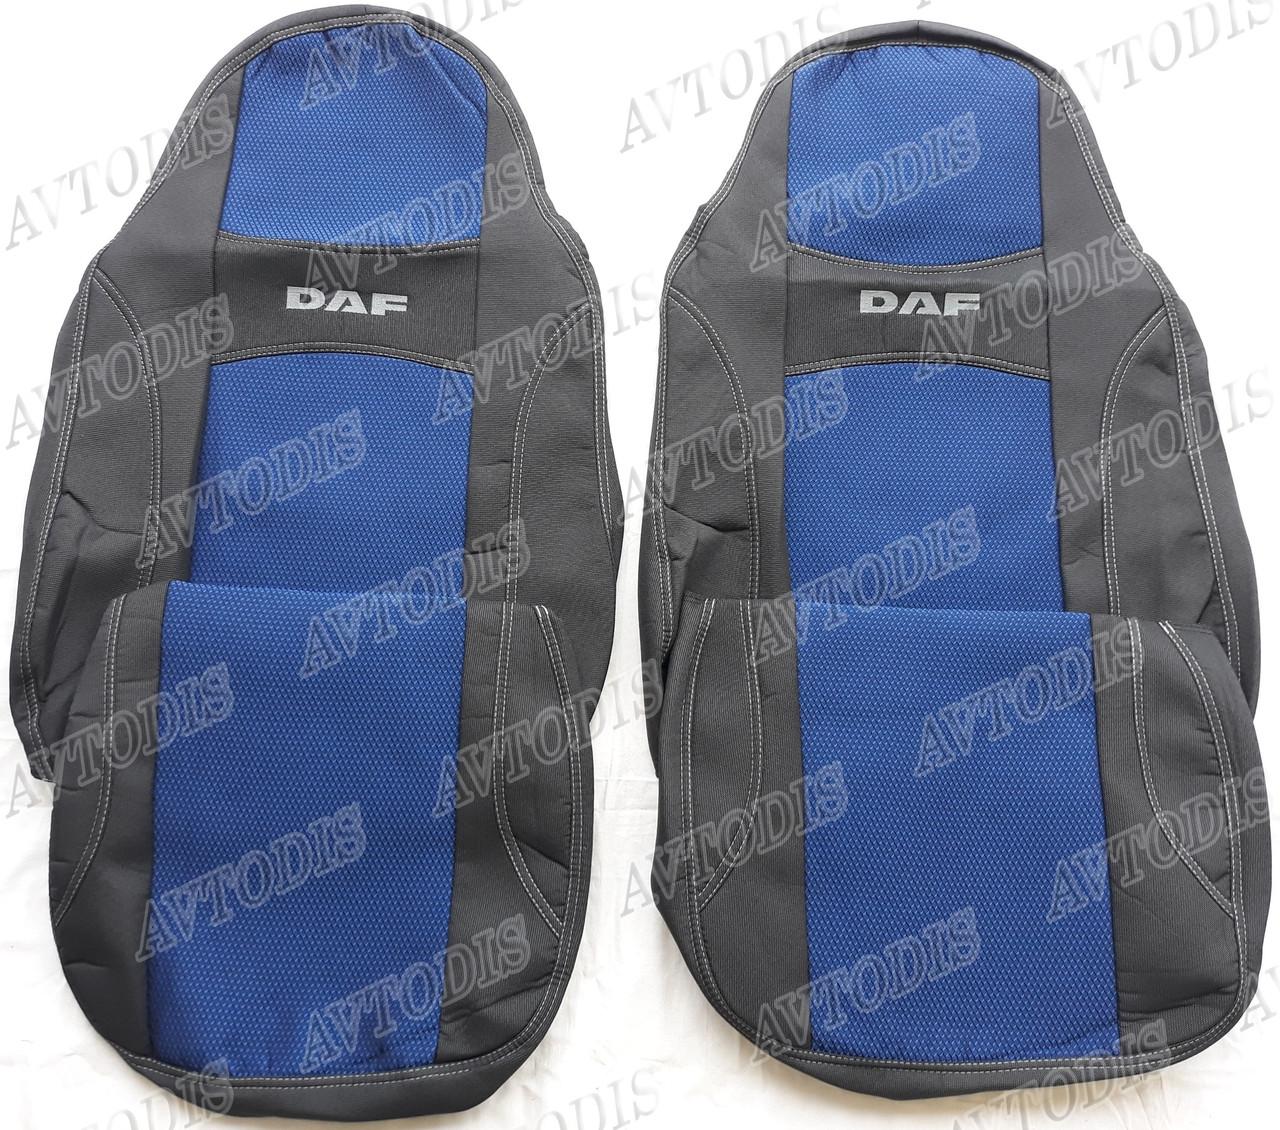 Авточехлы DAF XF 105 1+1 2005-2013 (синие) VIP ЛЮКС Nika